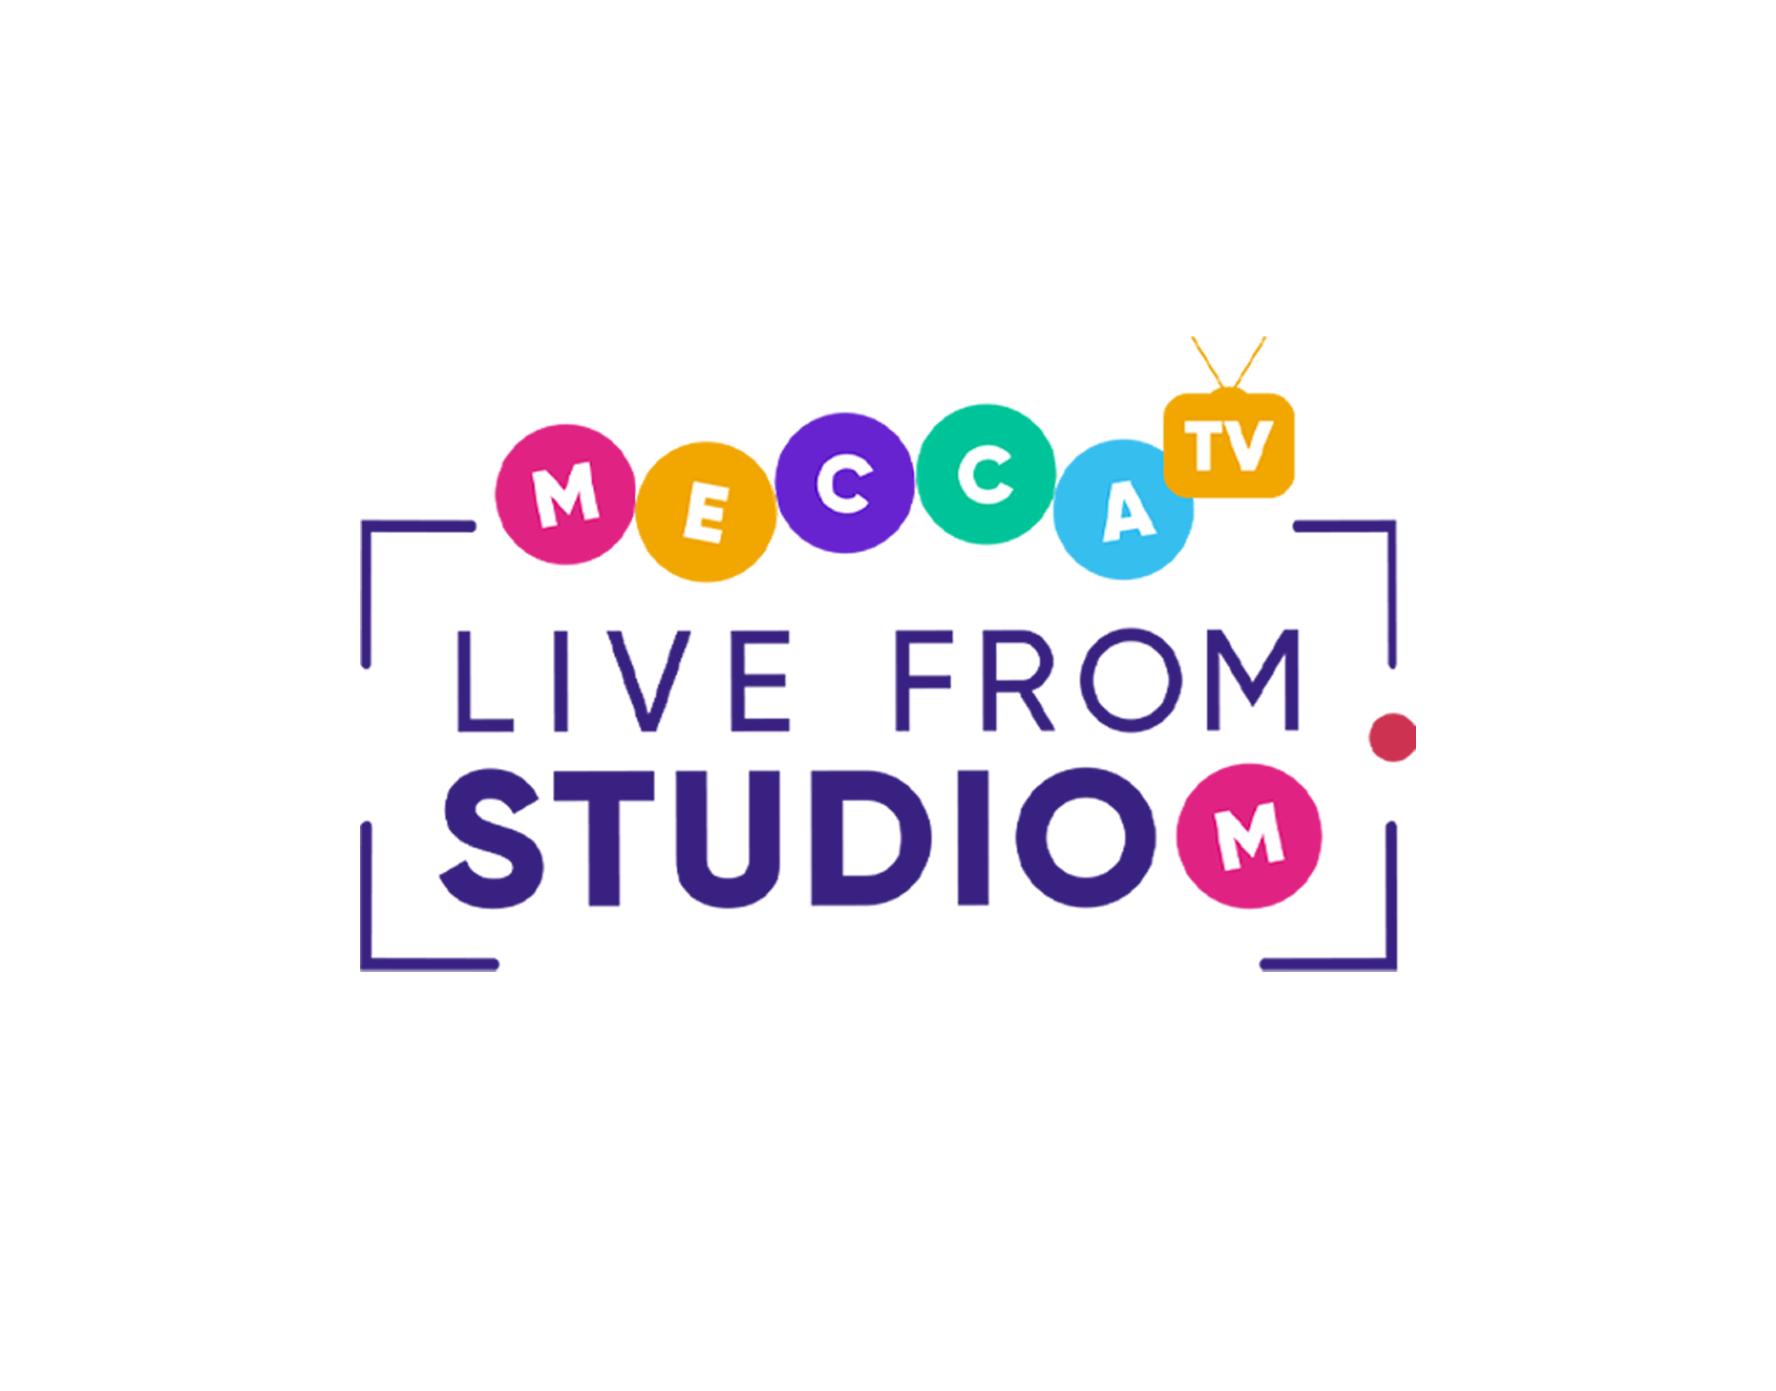 Mecca Studio M Logo